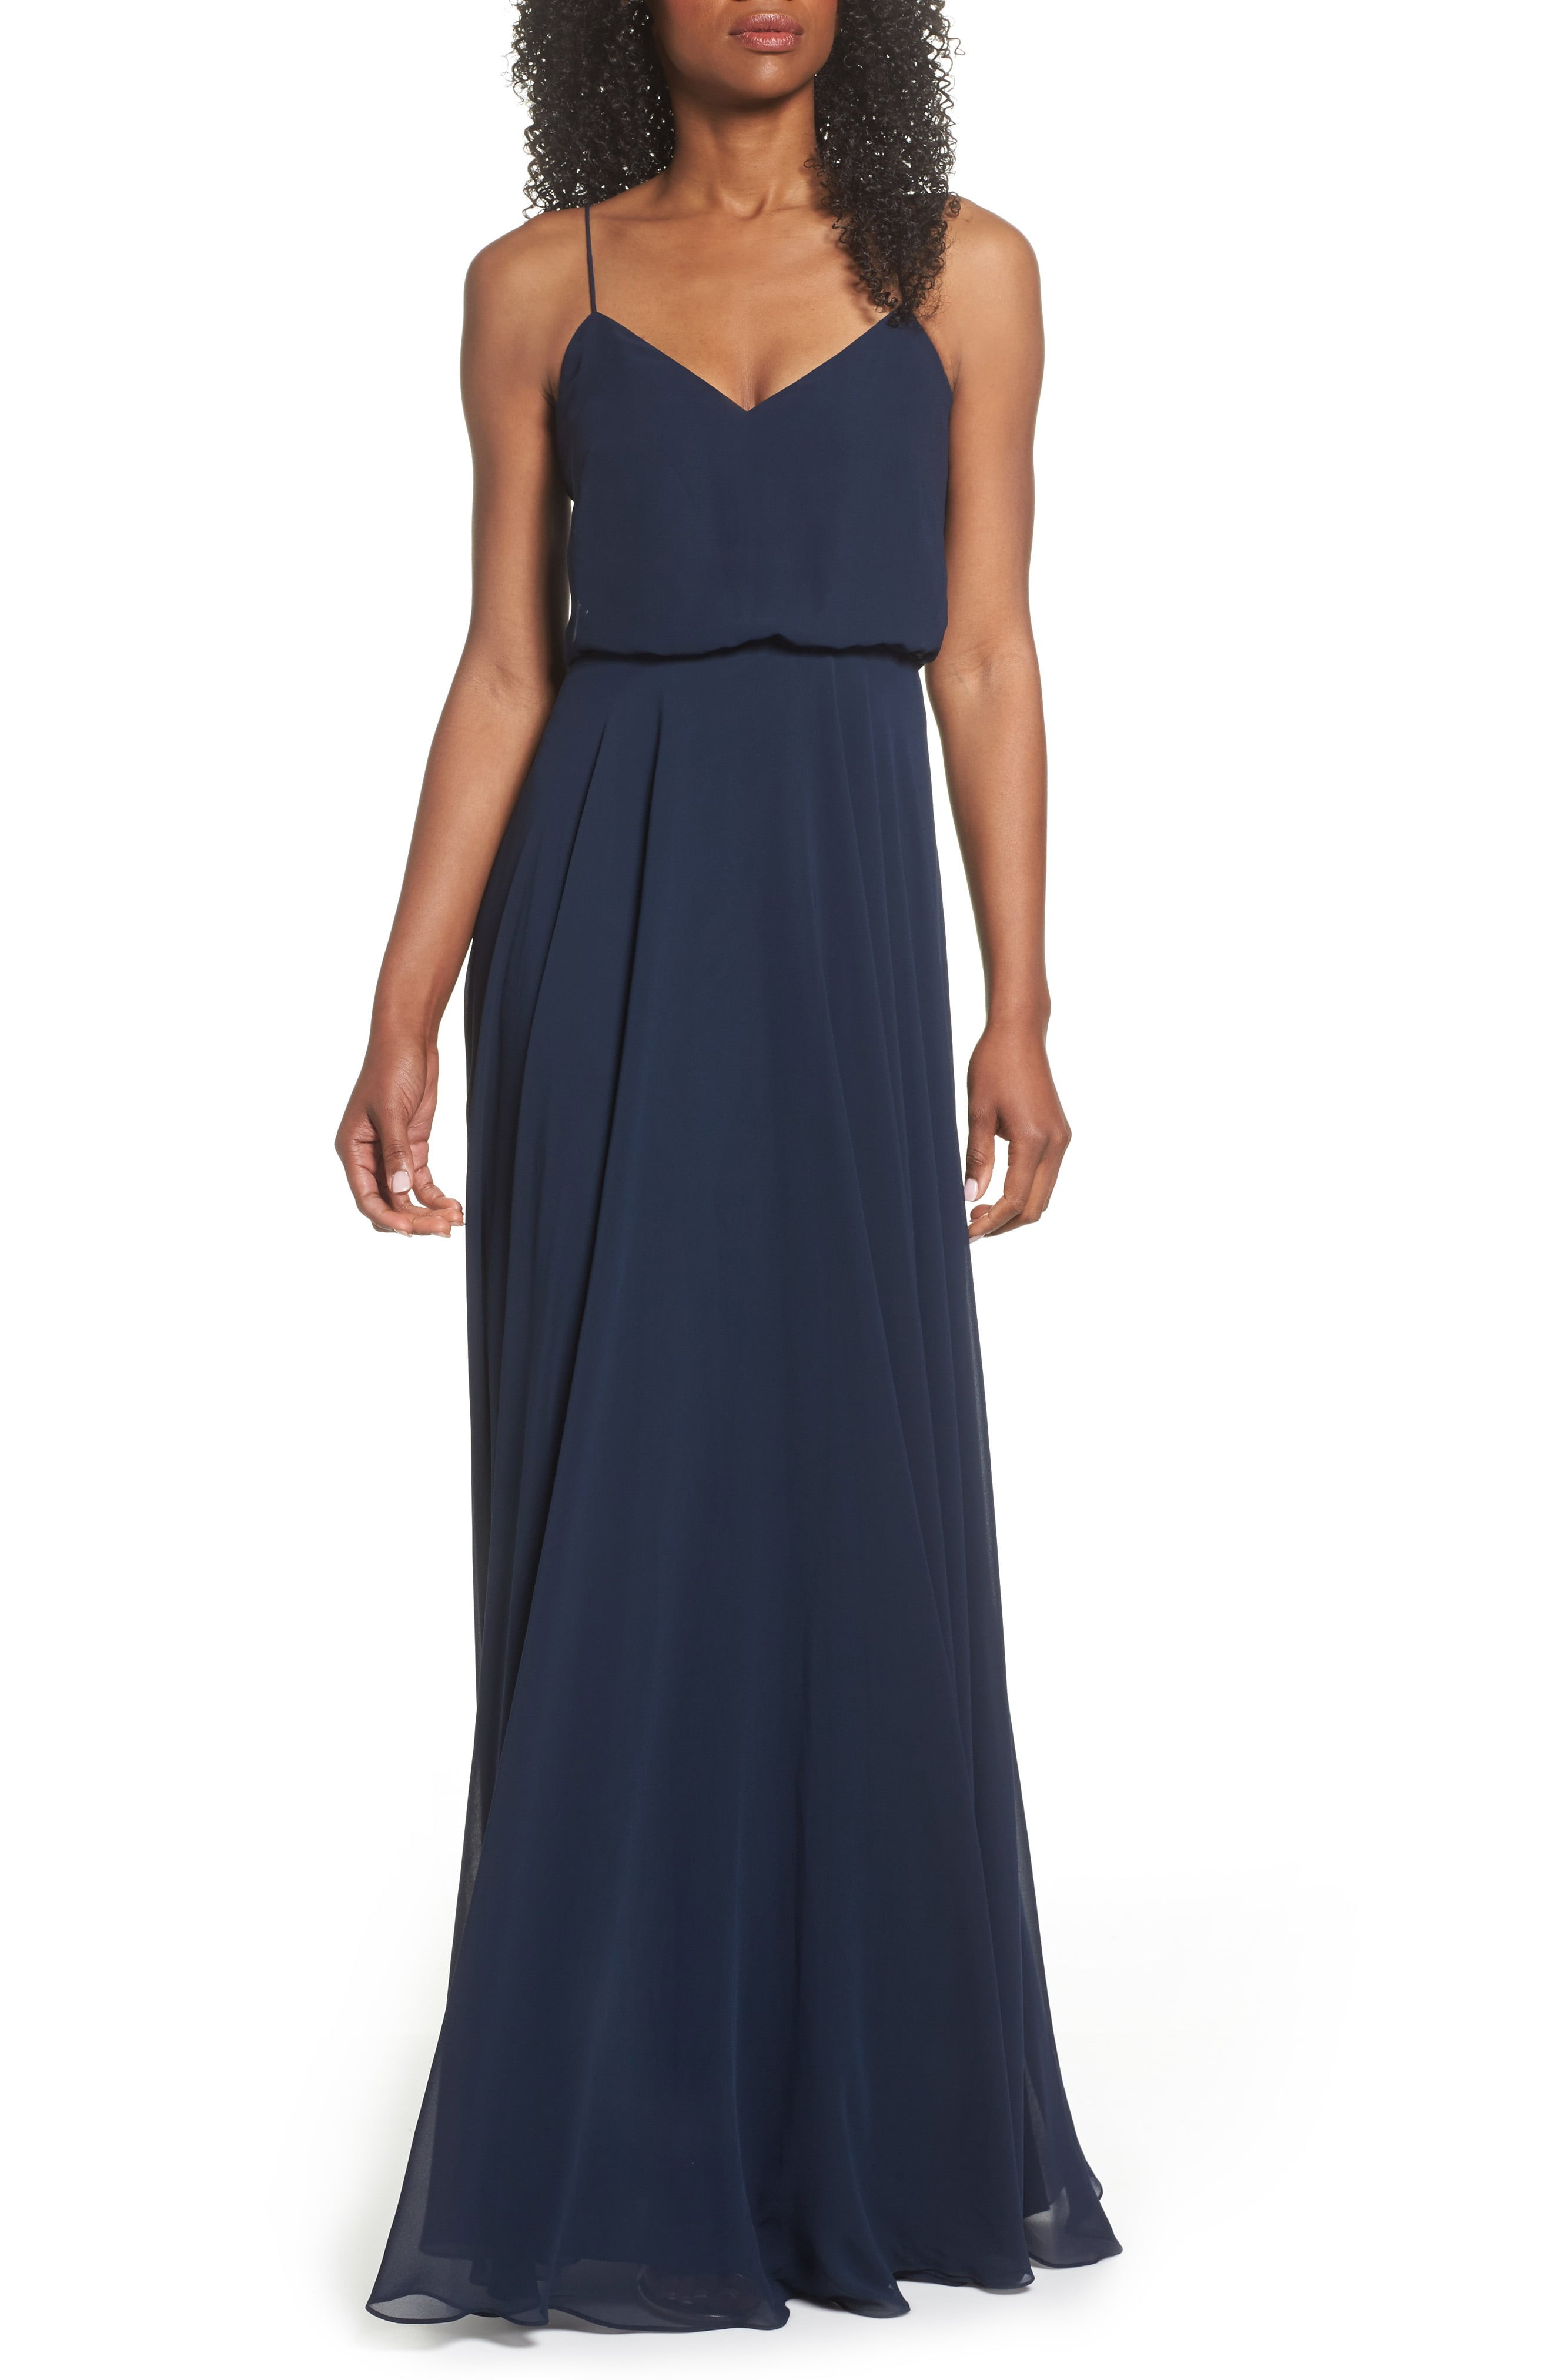 Dark blue bridesmaid dresses navy blue bridesmaid dresses nordstrom ombrellifo Images